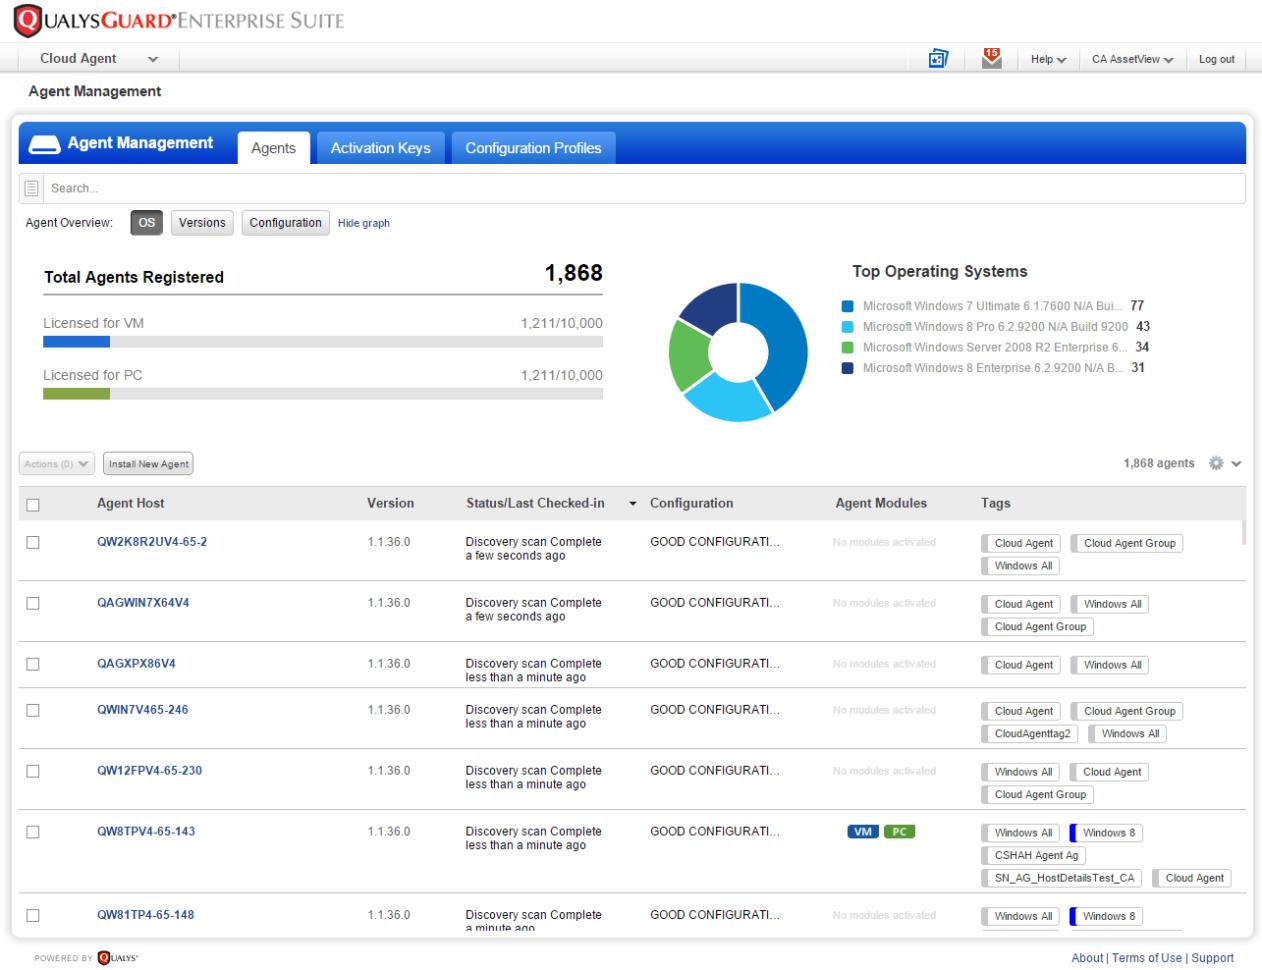 Ip Address Tracking Spreadsheet Template Pertaining To Tracking Spreadsheet Template Excel 1 Ip Address Spreadsheet